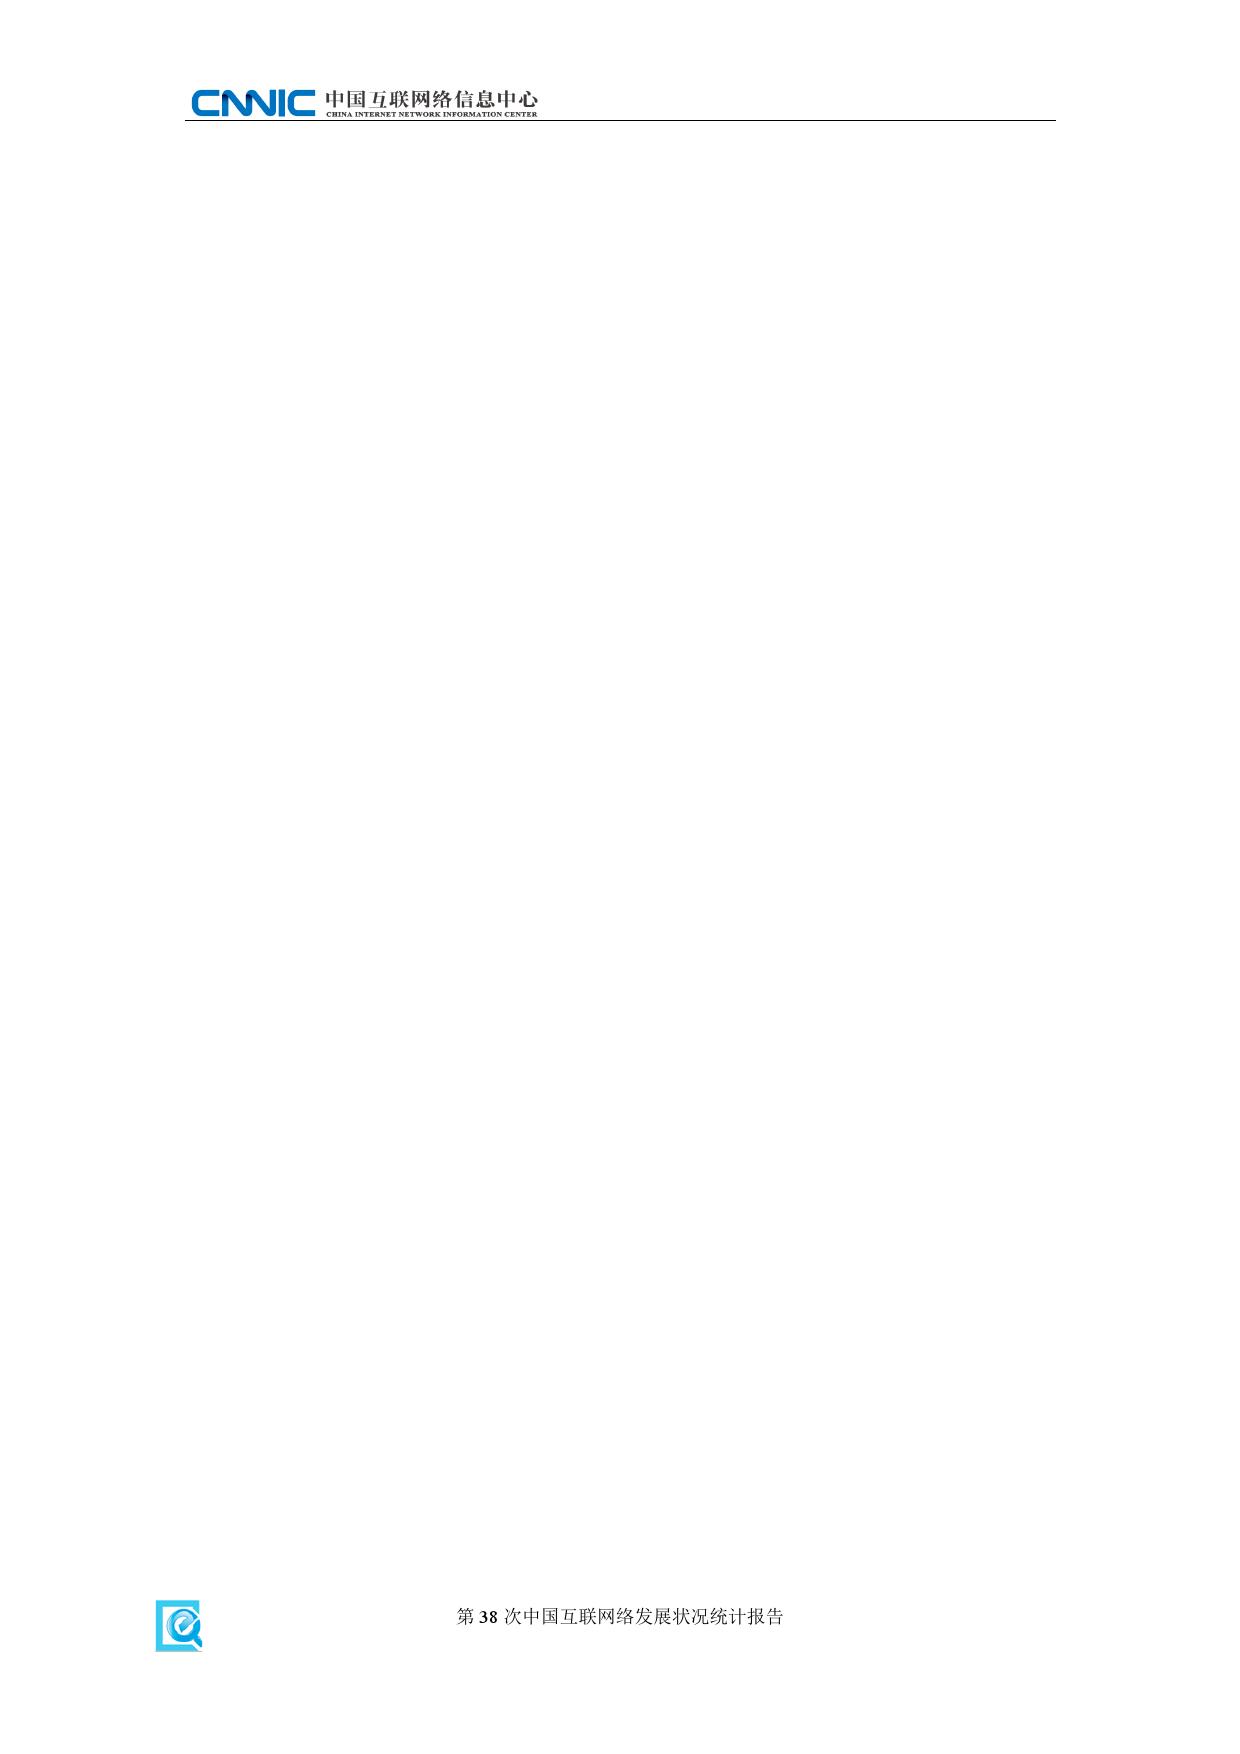 CNNIC:2015年第38次中国互联网络发展状况统计报告_000004